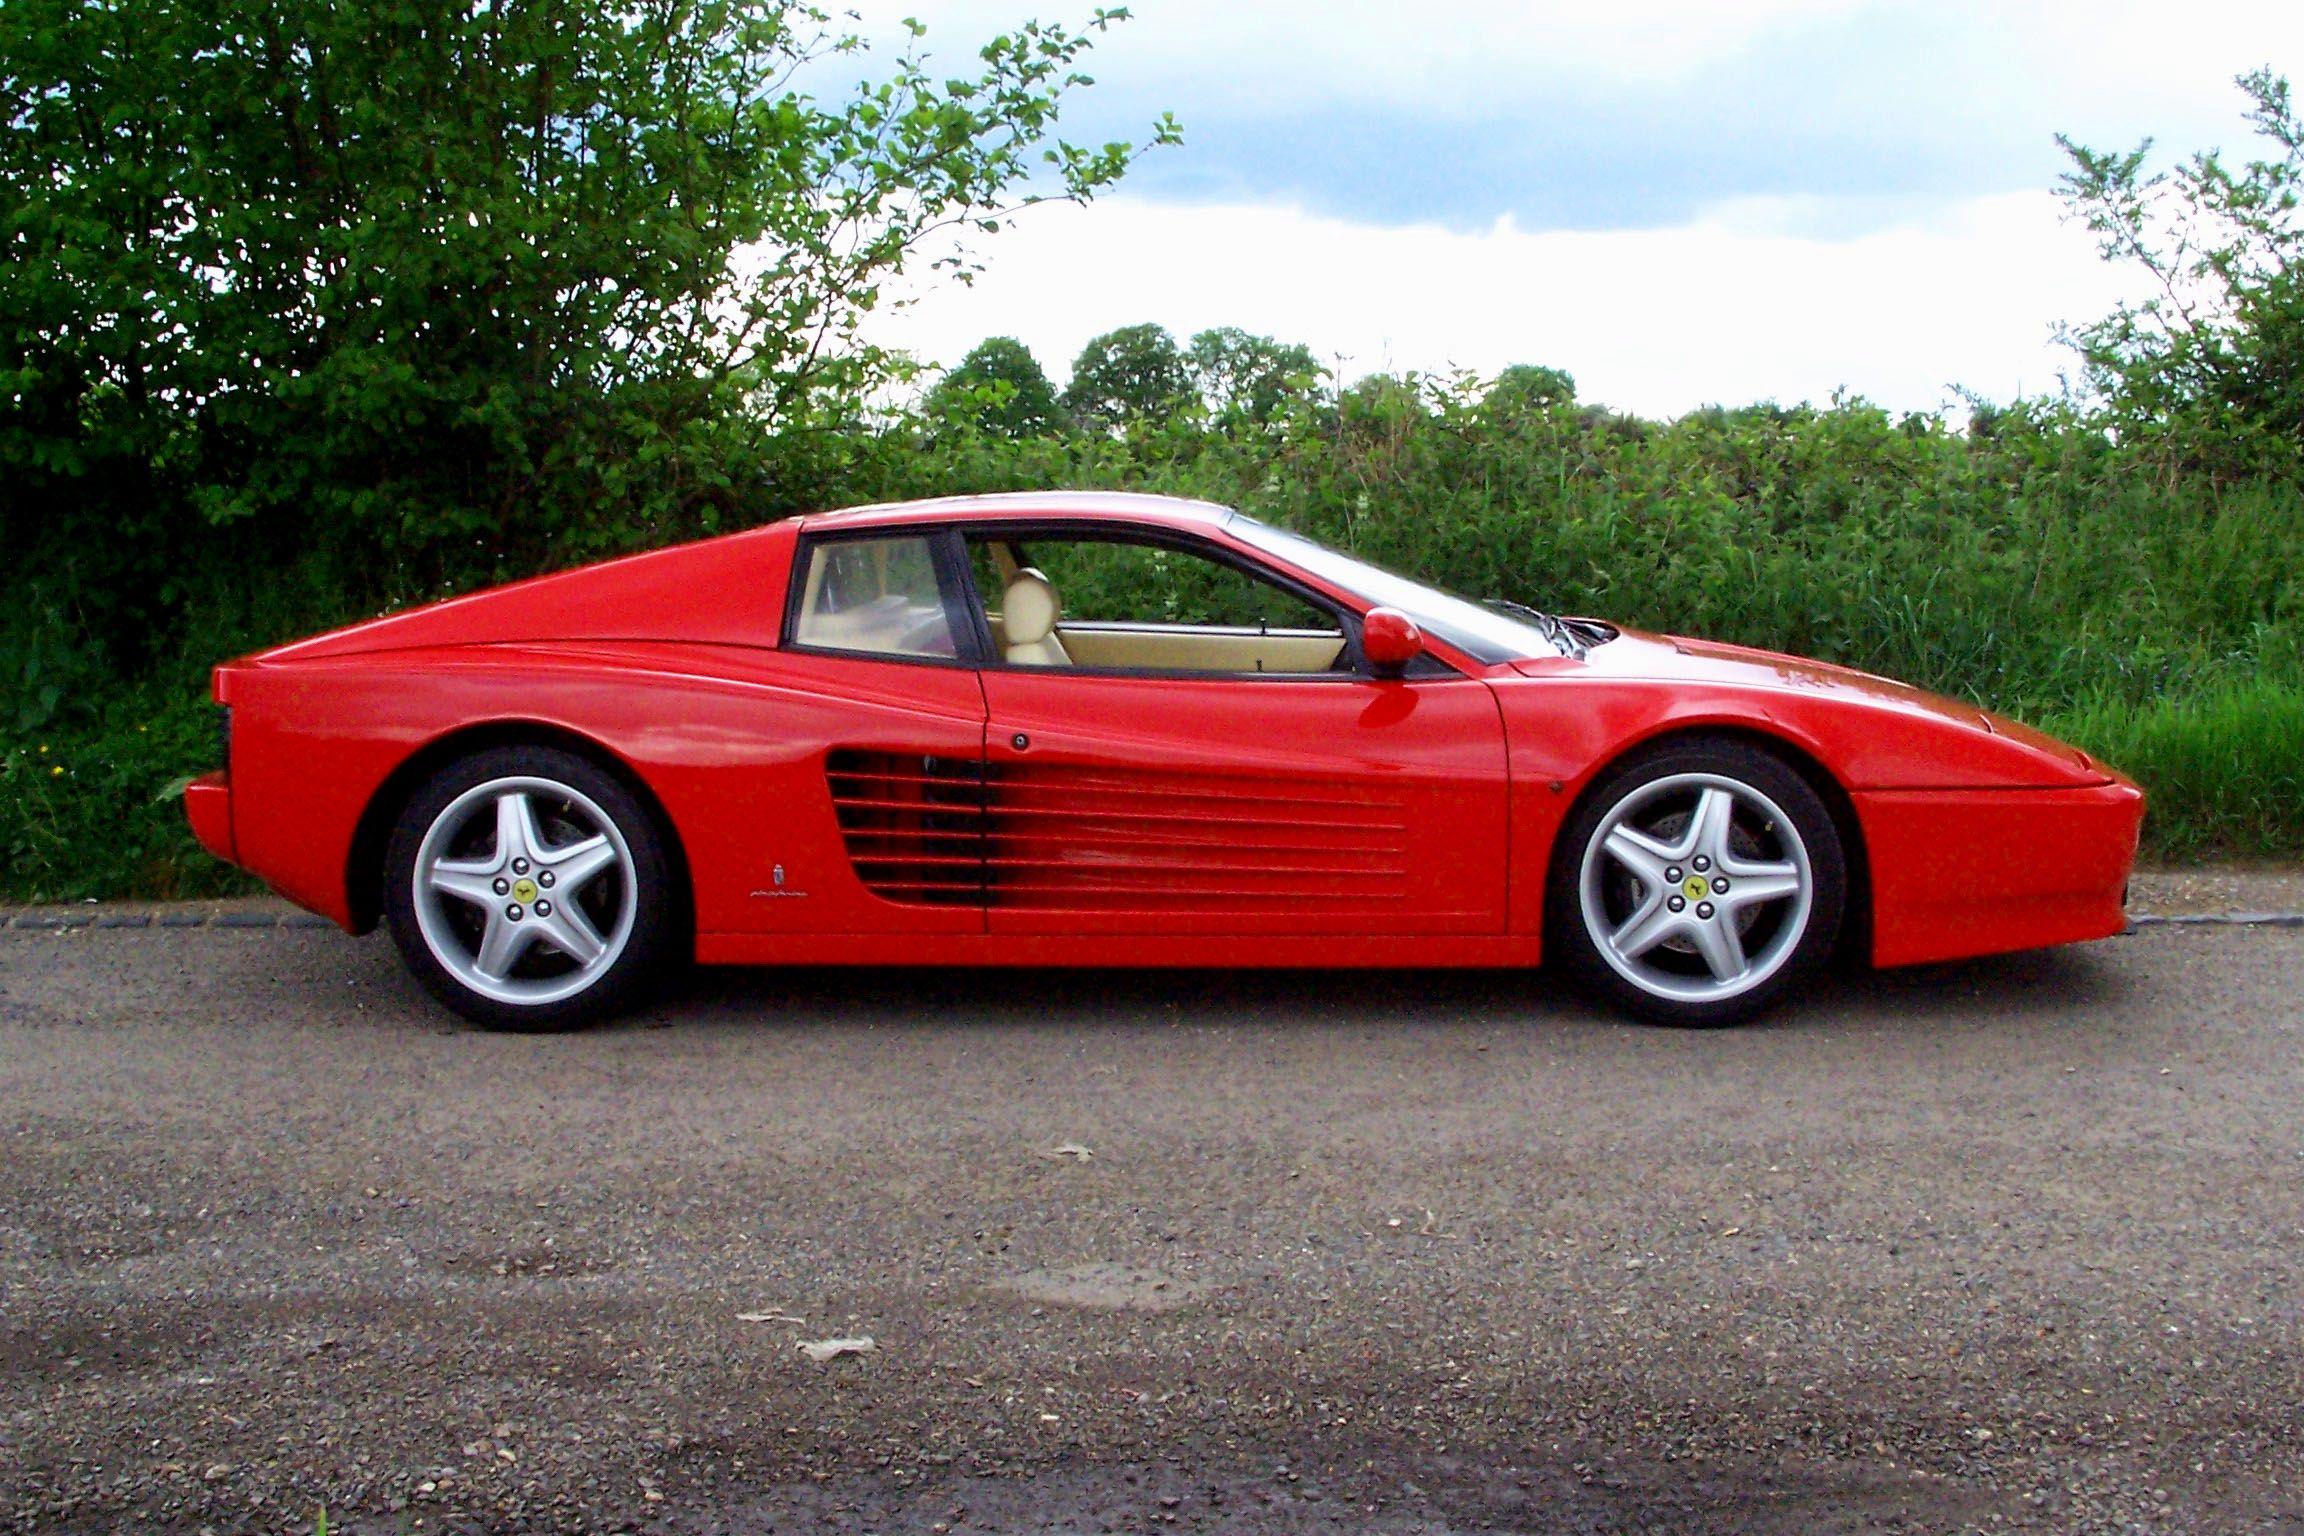 Ferrari 512 tr ferrari pinterest ferrari cars and sports cars ferrari 512 tr pictures wallpapers wallpaper of 5 vanachro Image collections